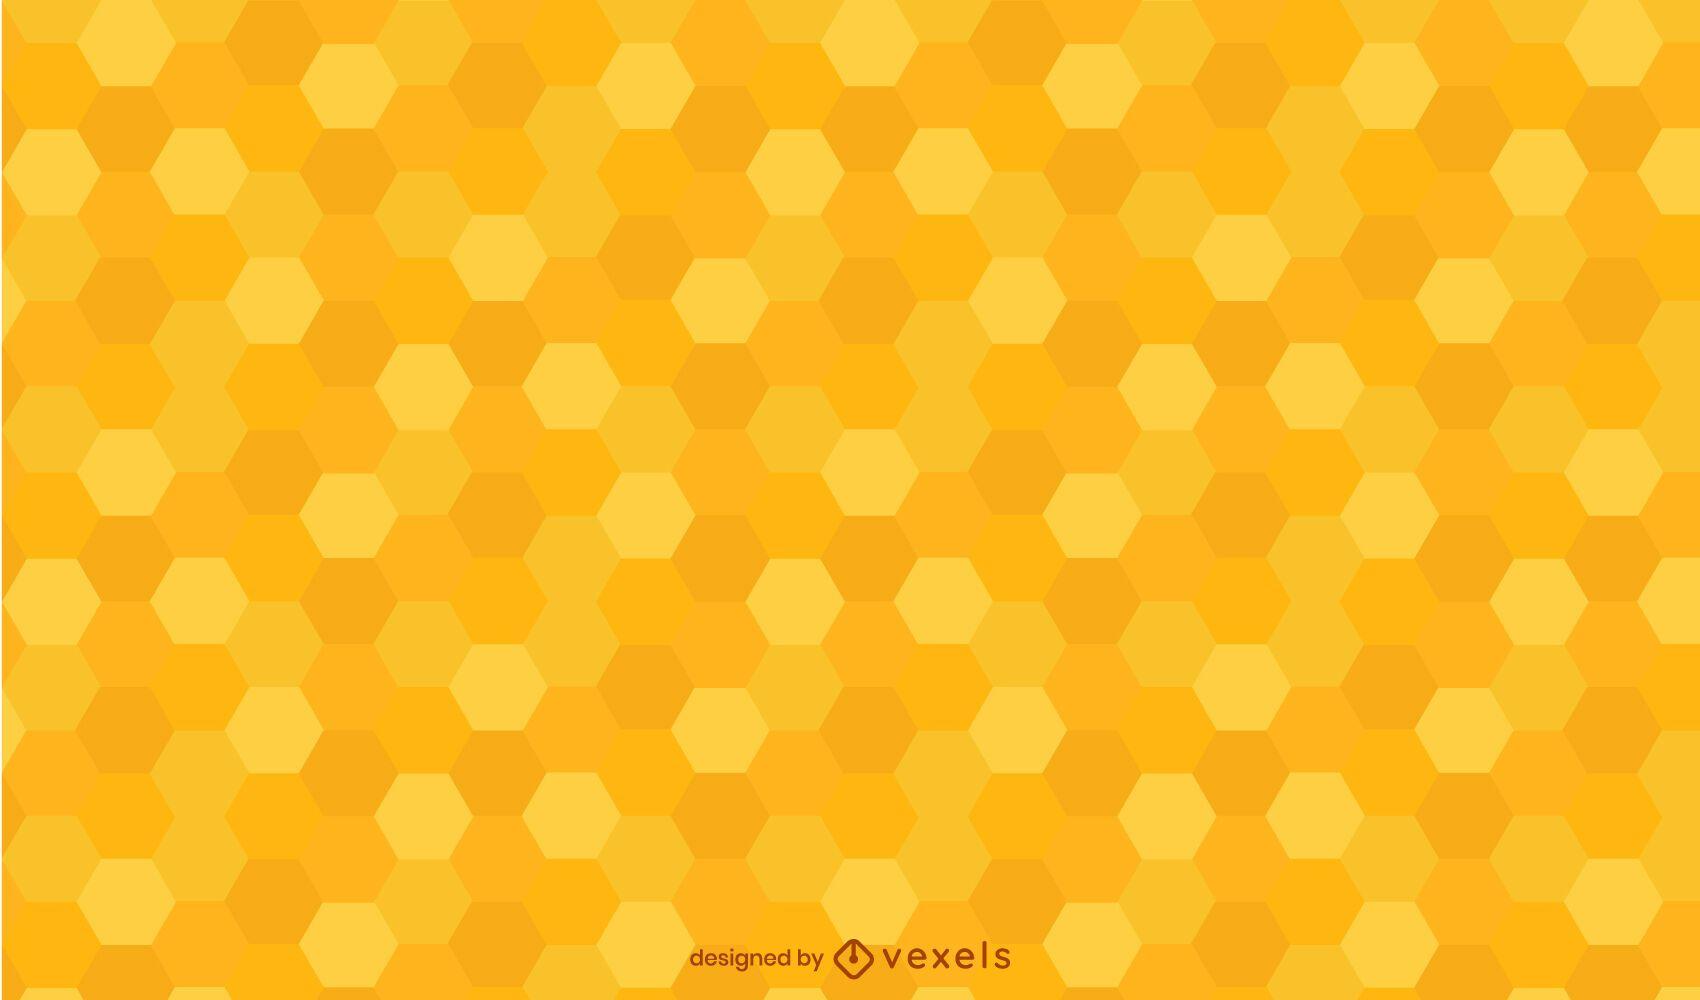 Honeycomb pattern design